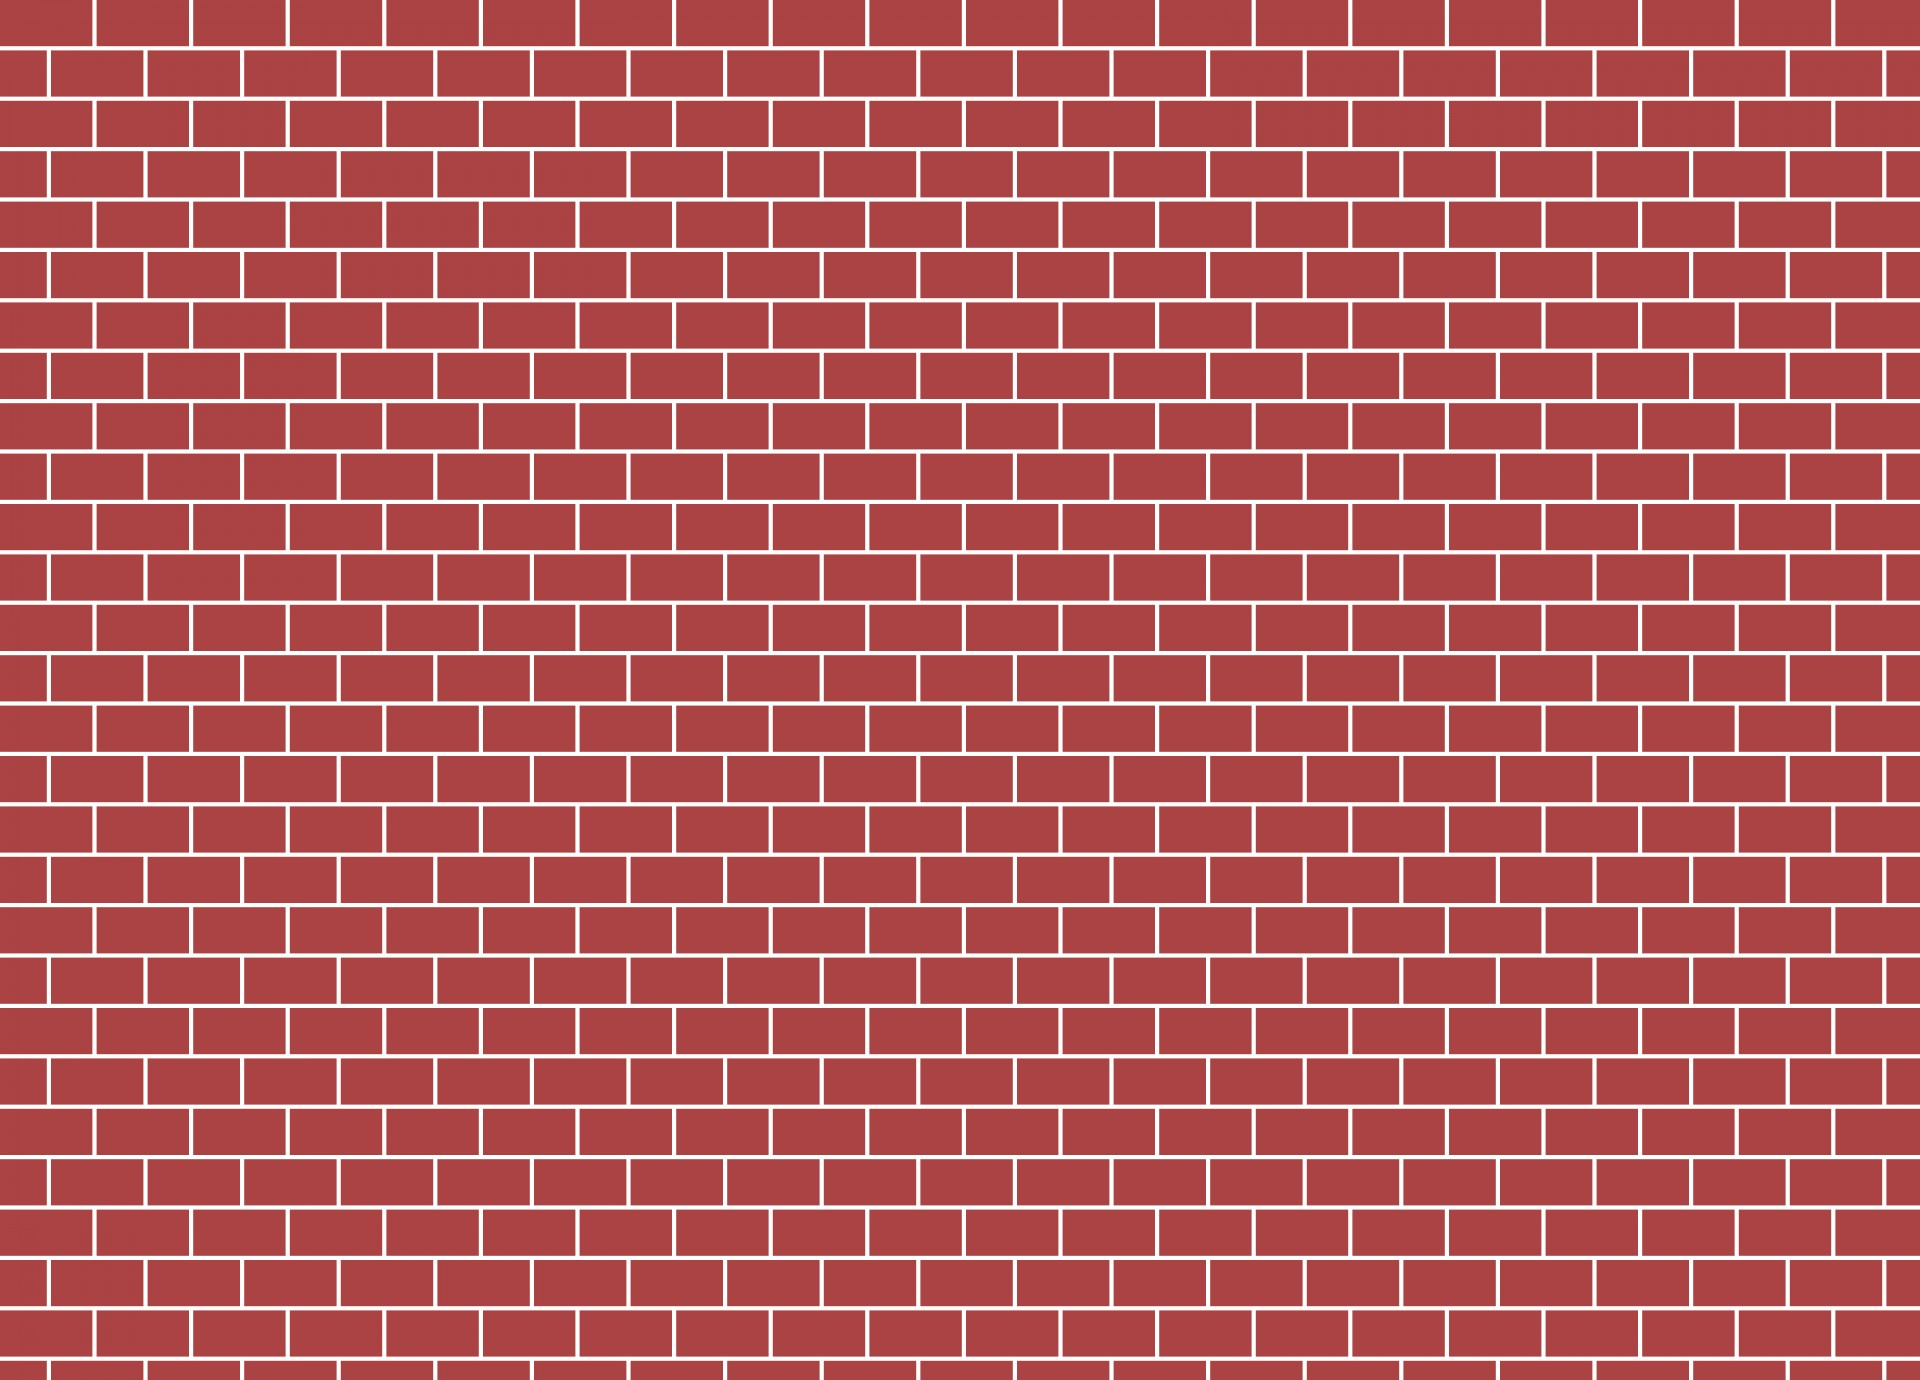 Wall free stock photo. Brick clipart red brick